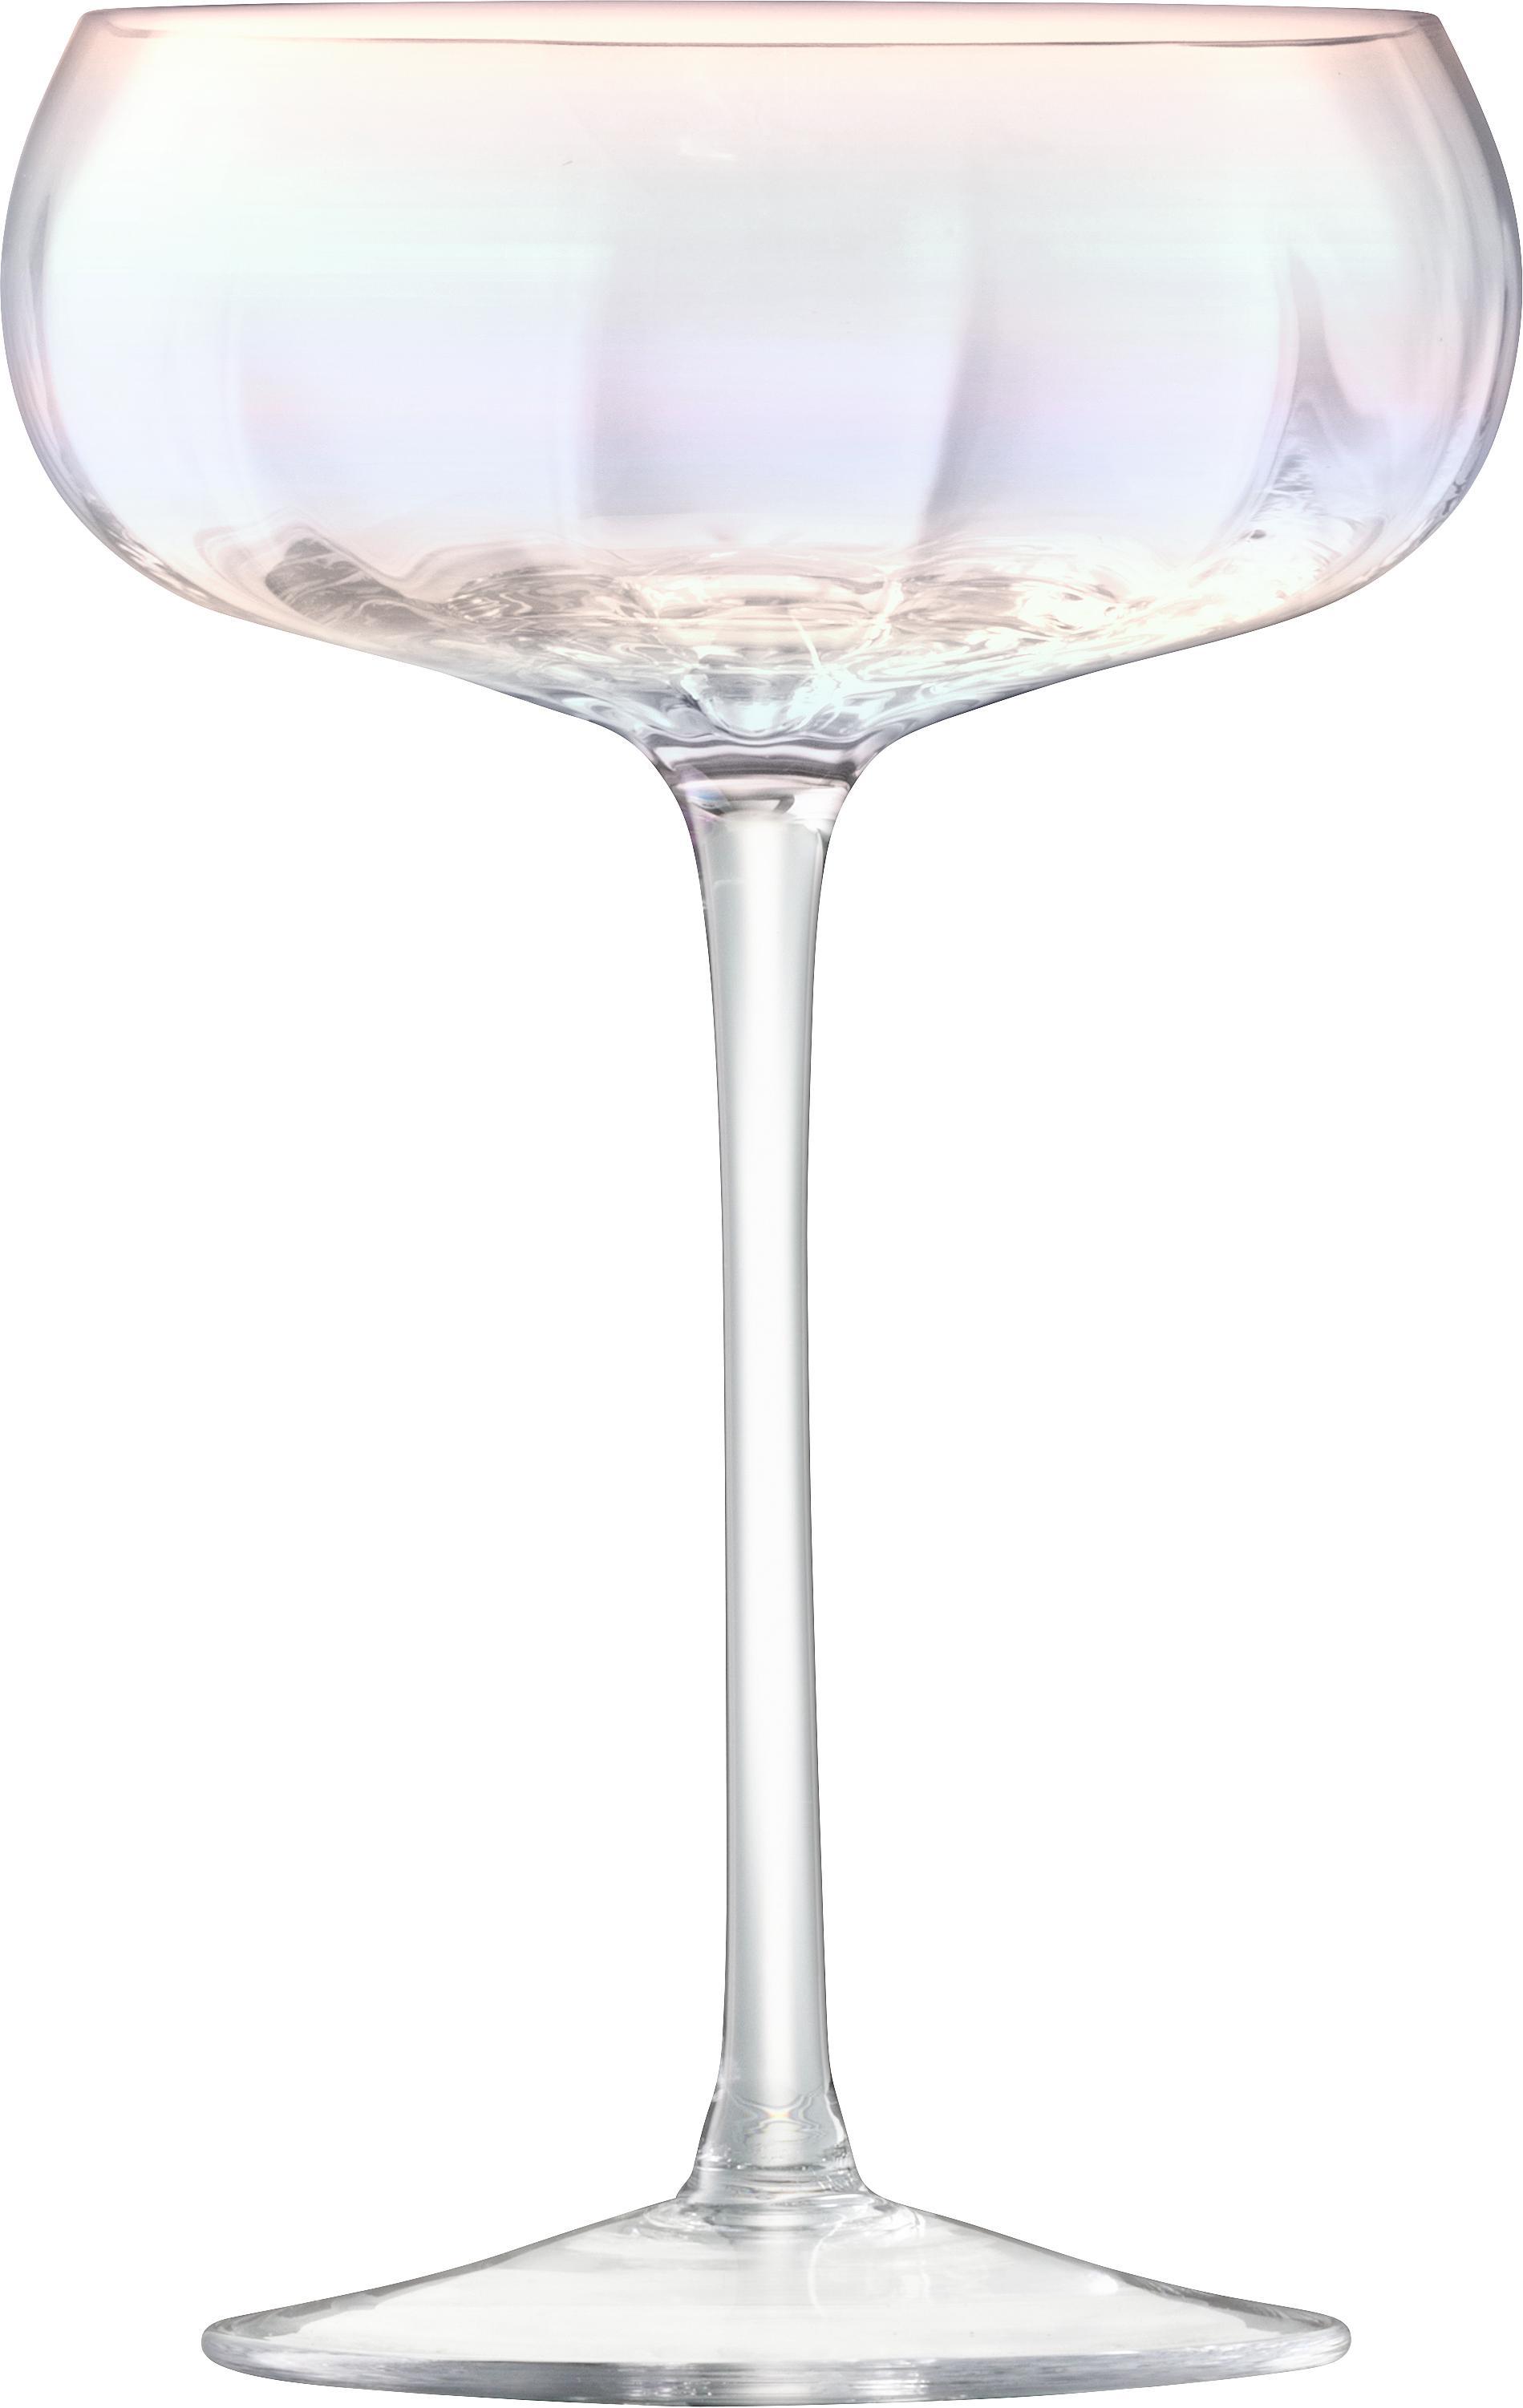 Coppa champagne in vetro soffiato Pearl 4 pz, Vetro, Riflessi madreperlacei, Ø 11 x Alt. 16 cm